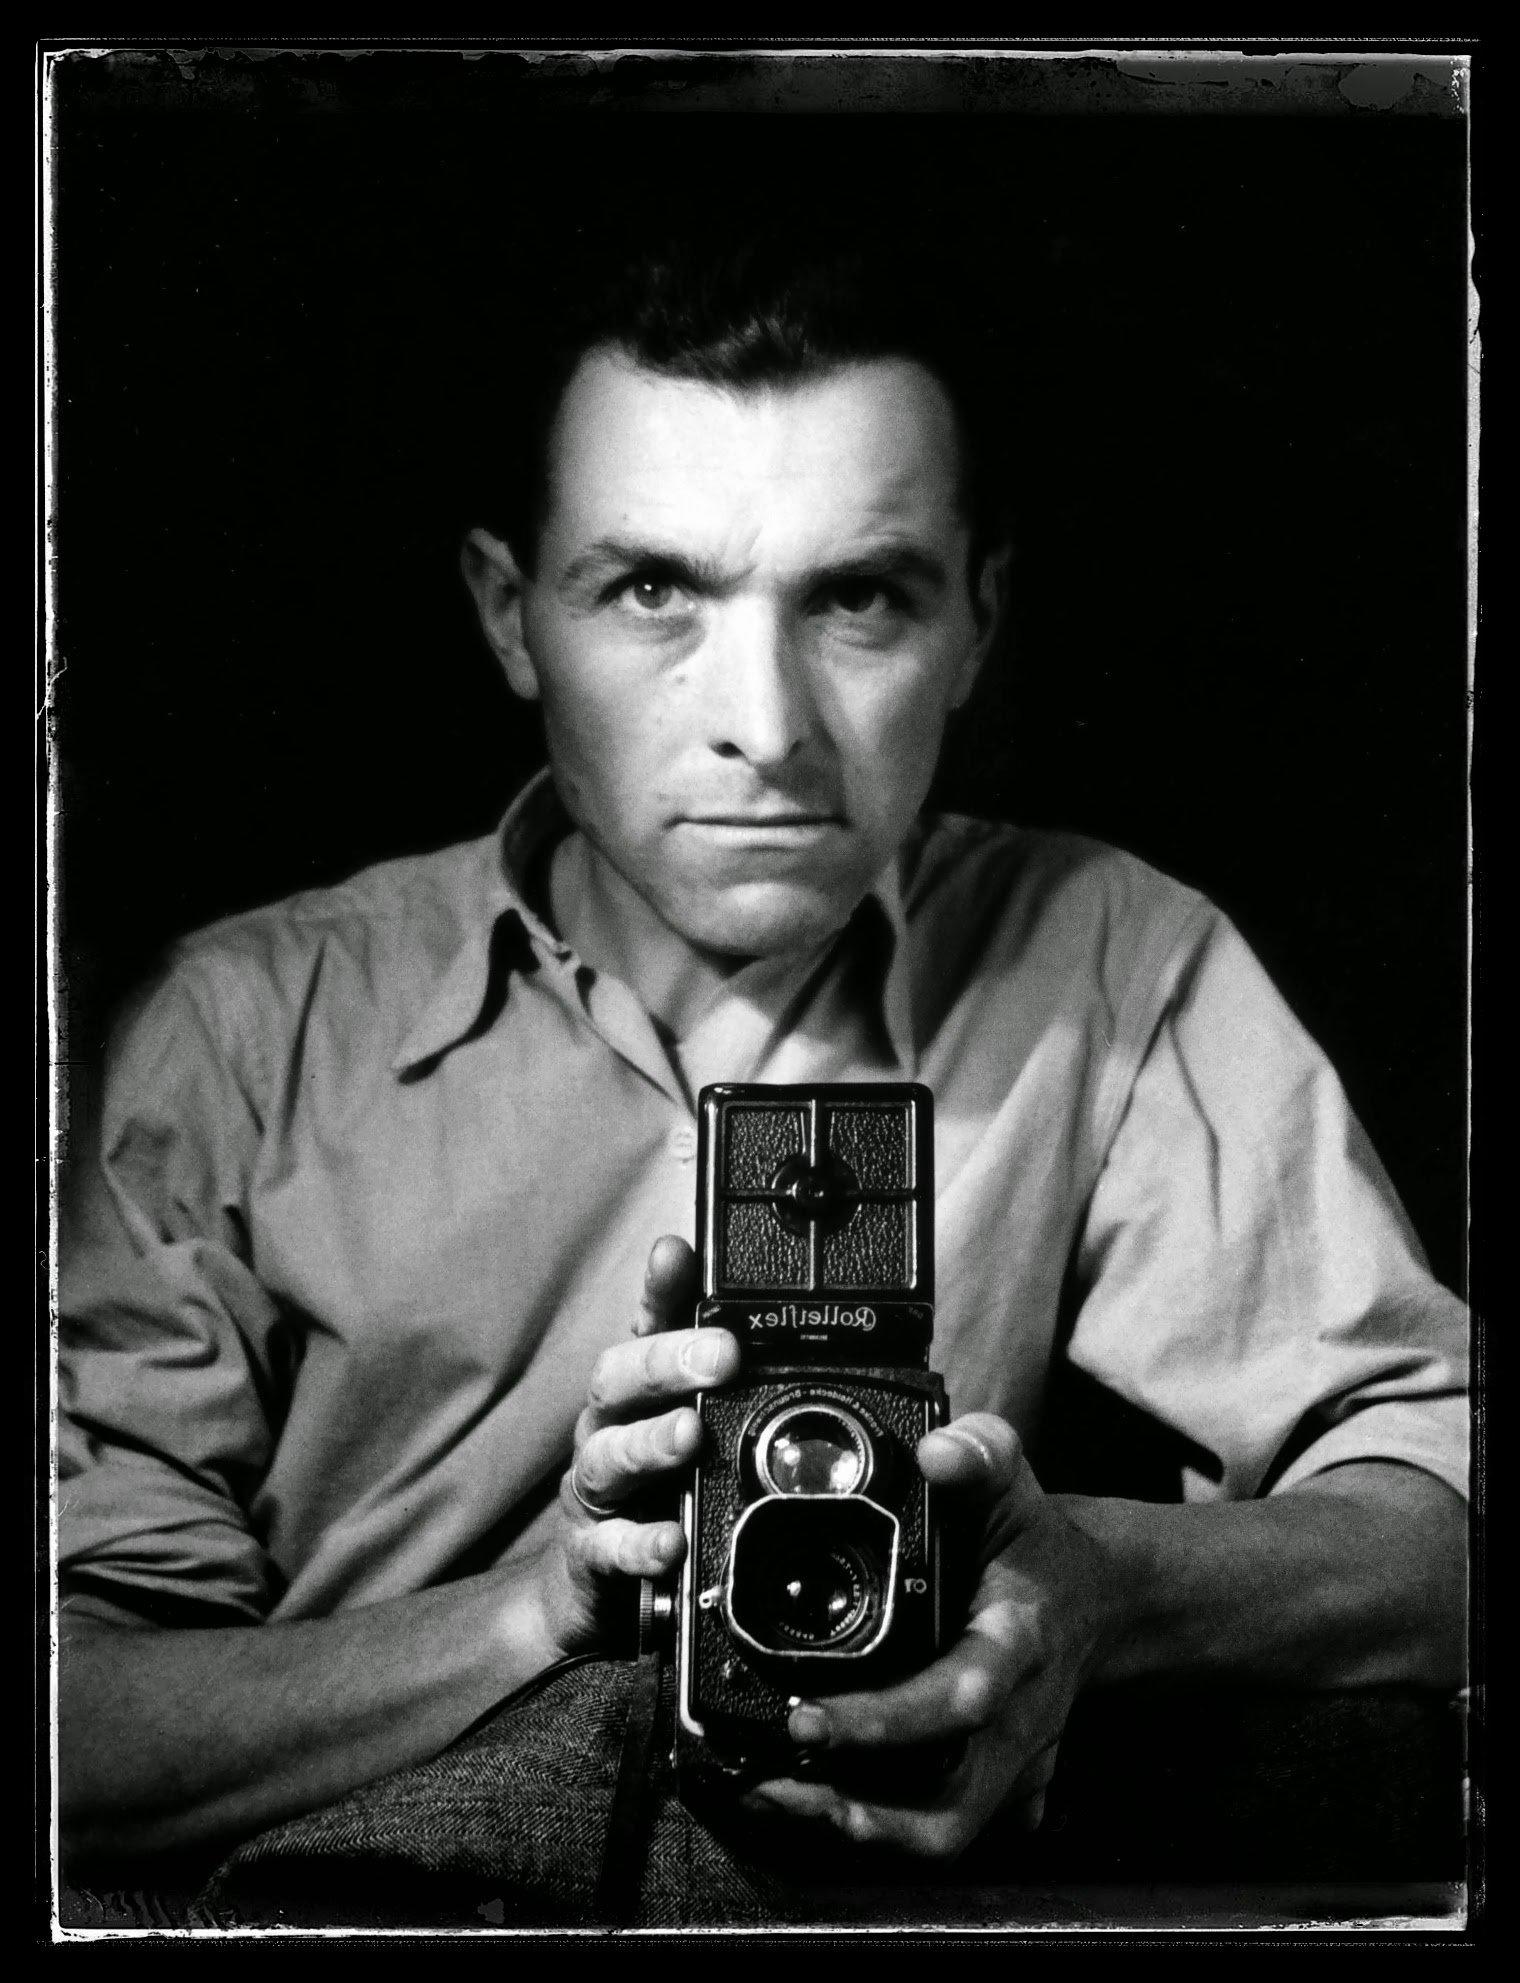 Robert Doisneau Autoritratto Rolleiflex